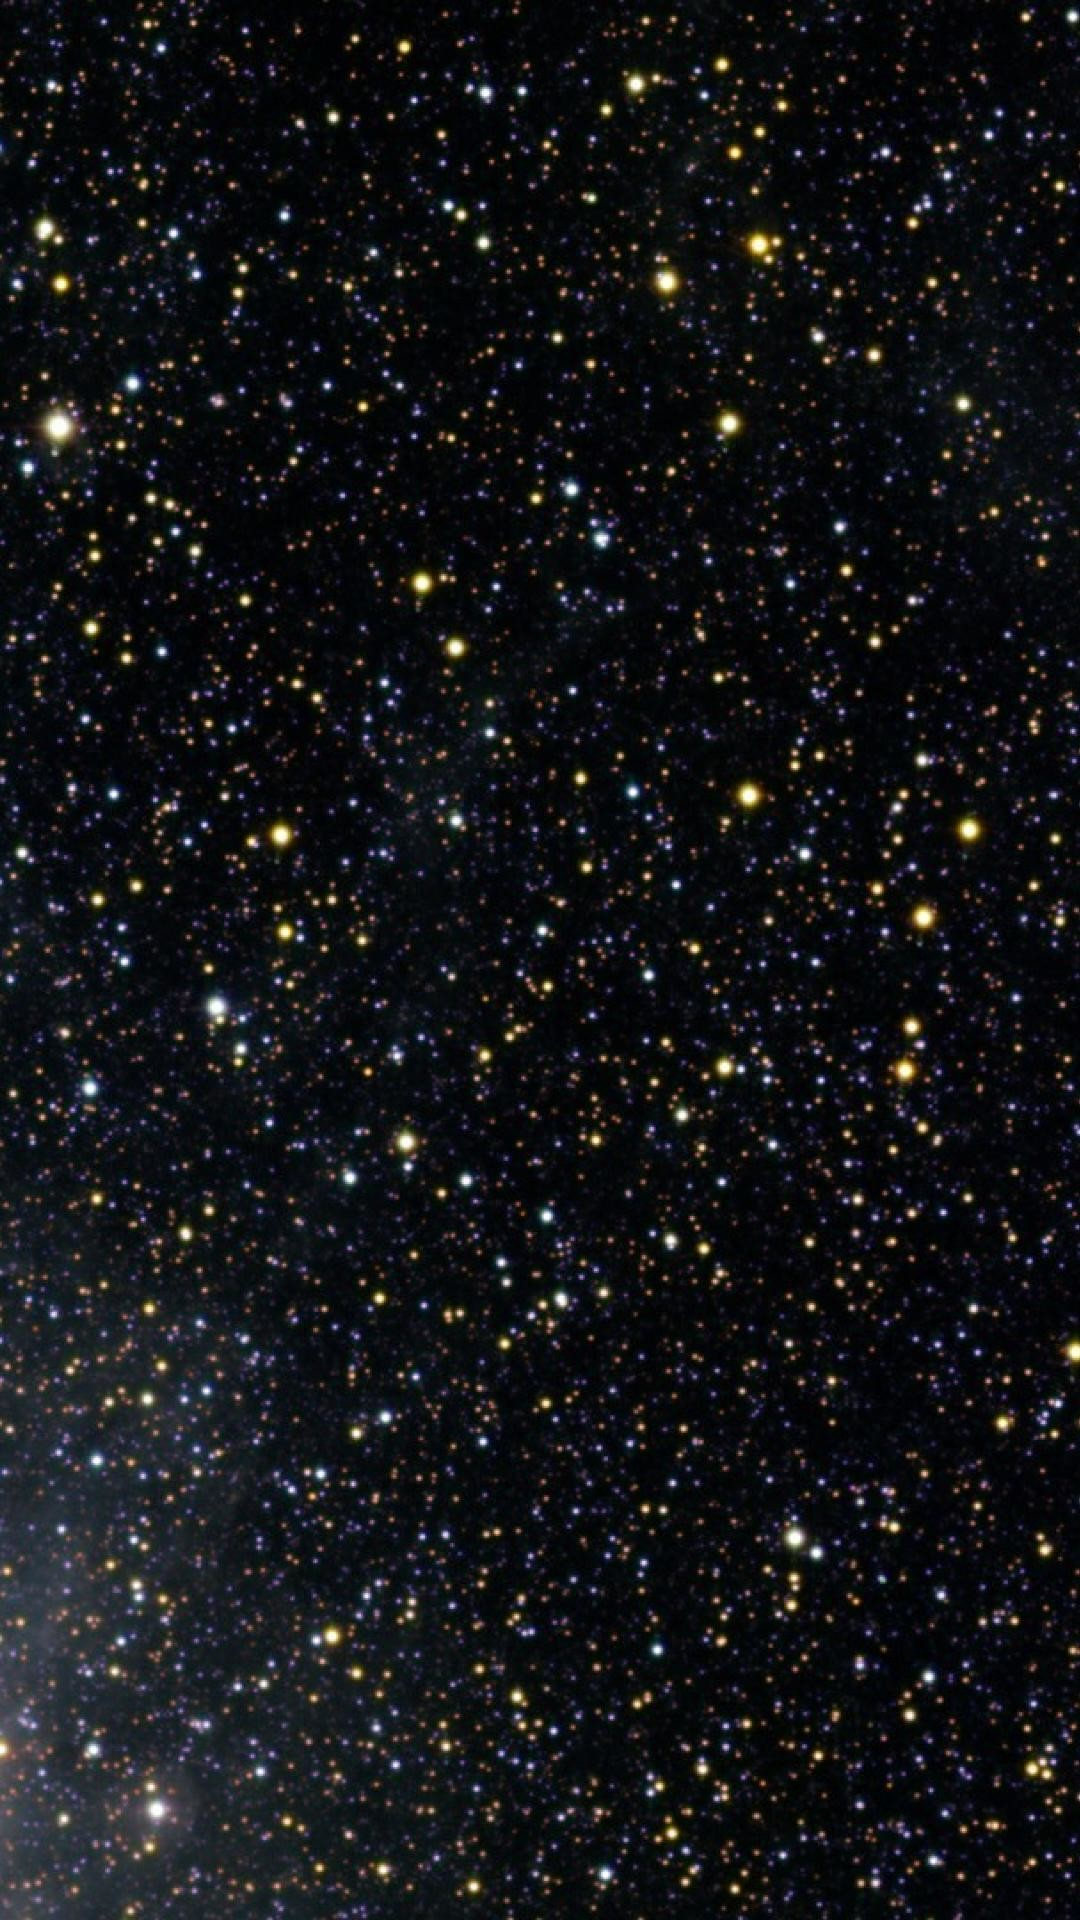 Space Stars Hd Iphone 6 Plus Wallpaper